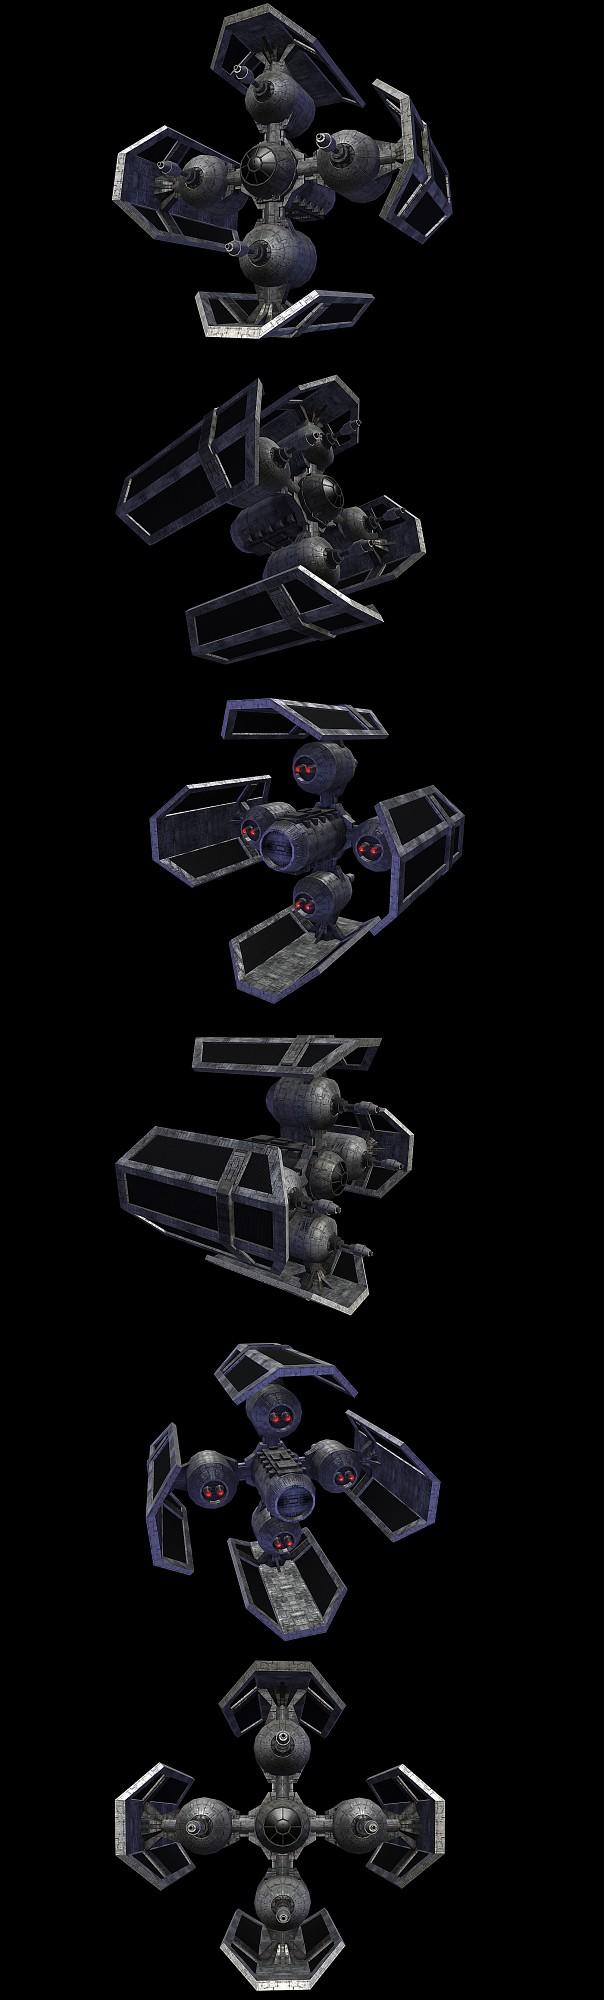 TIE/tl (turbolaser): TIE-Annihilator